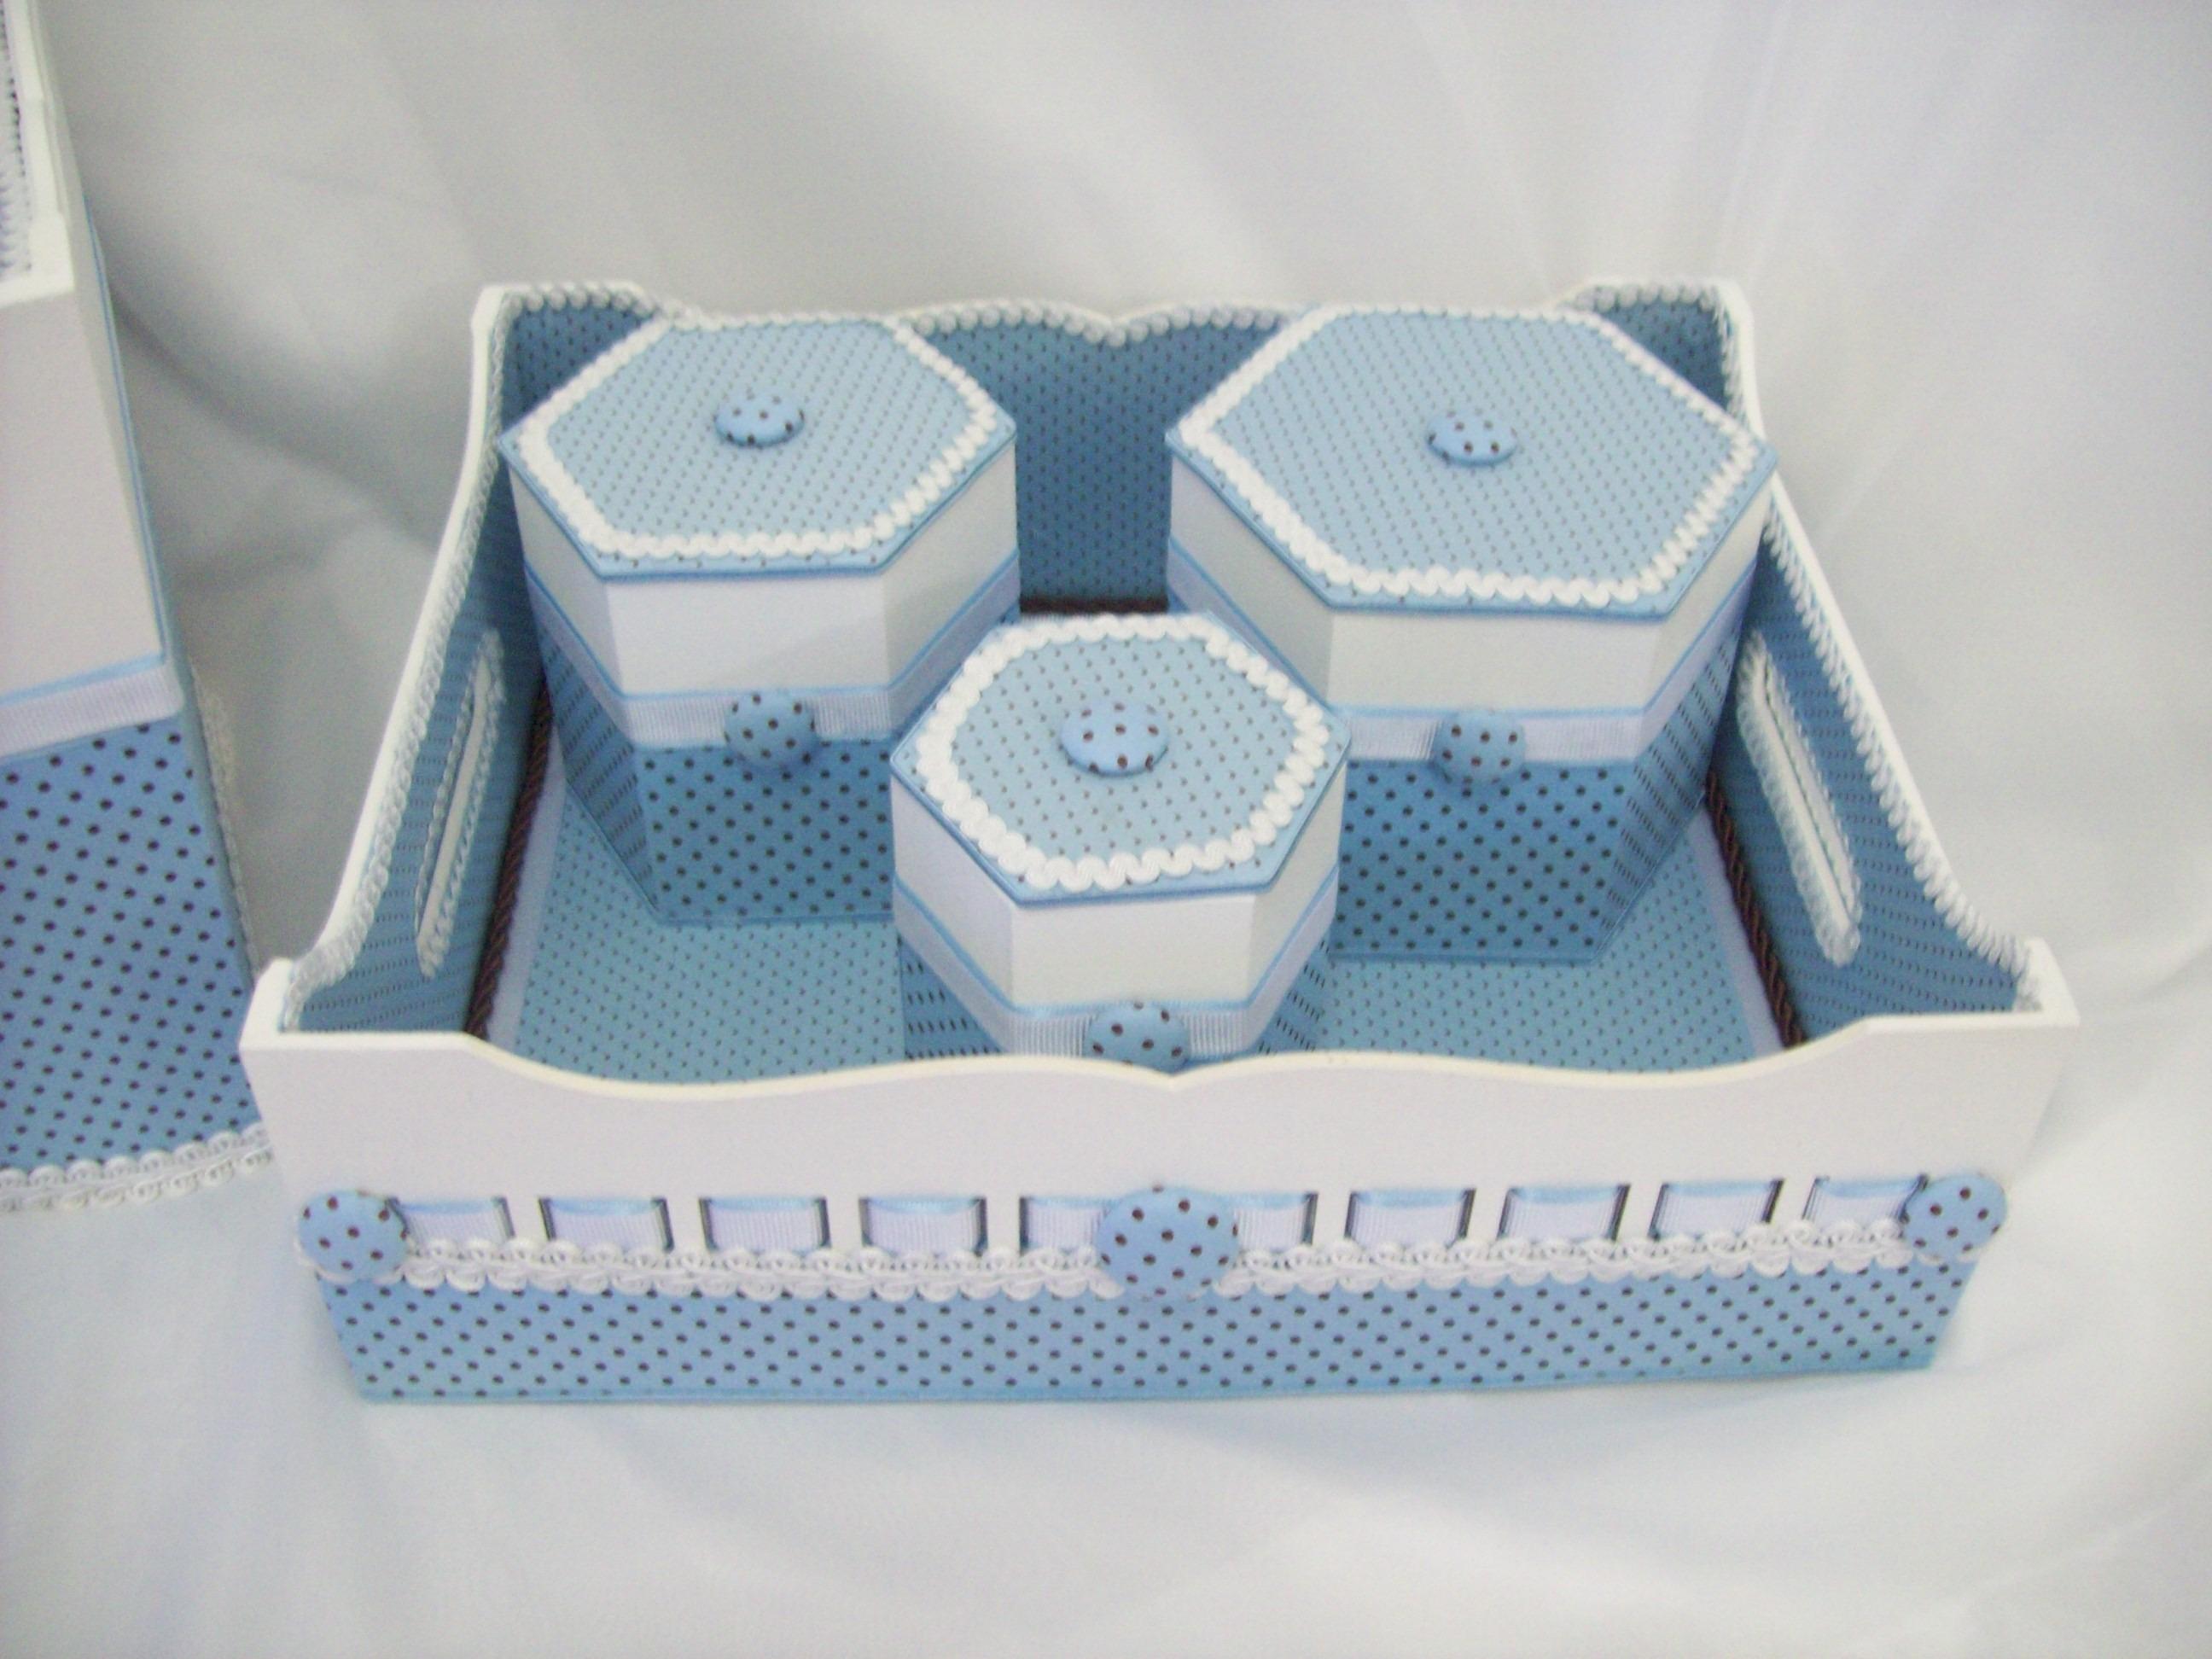 Kit Higiene Para Bebe Menino Azul Caixa Madeira Mdf Passa Fitas C 034 ...